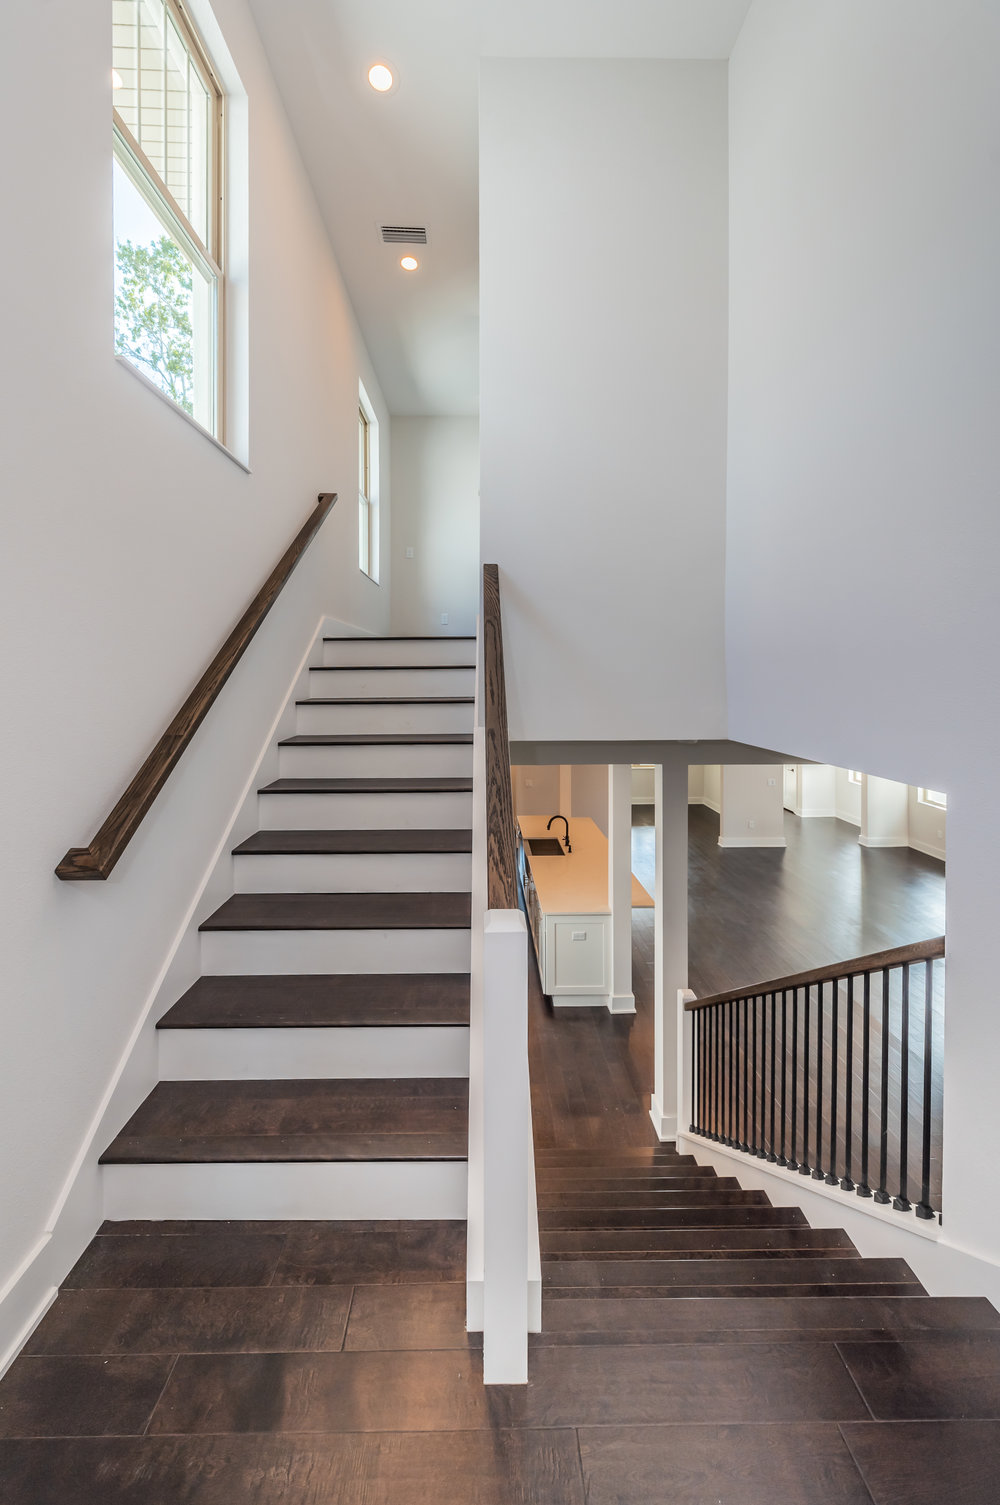 Staircase2-2.jpg